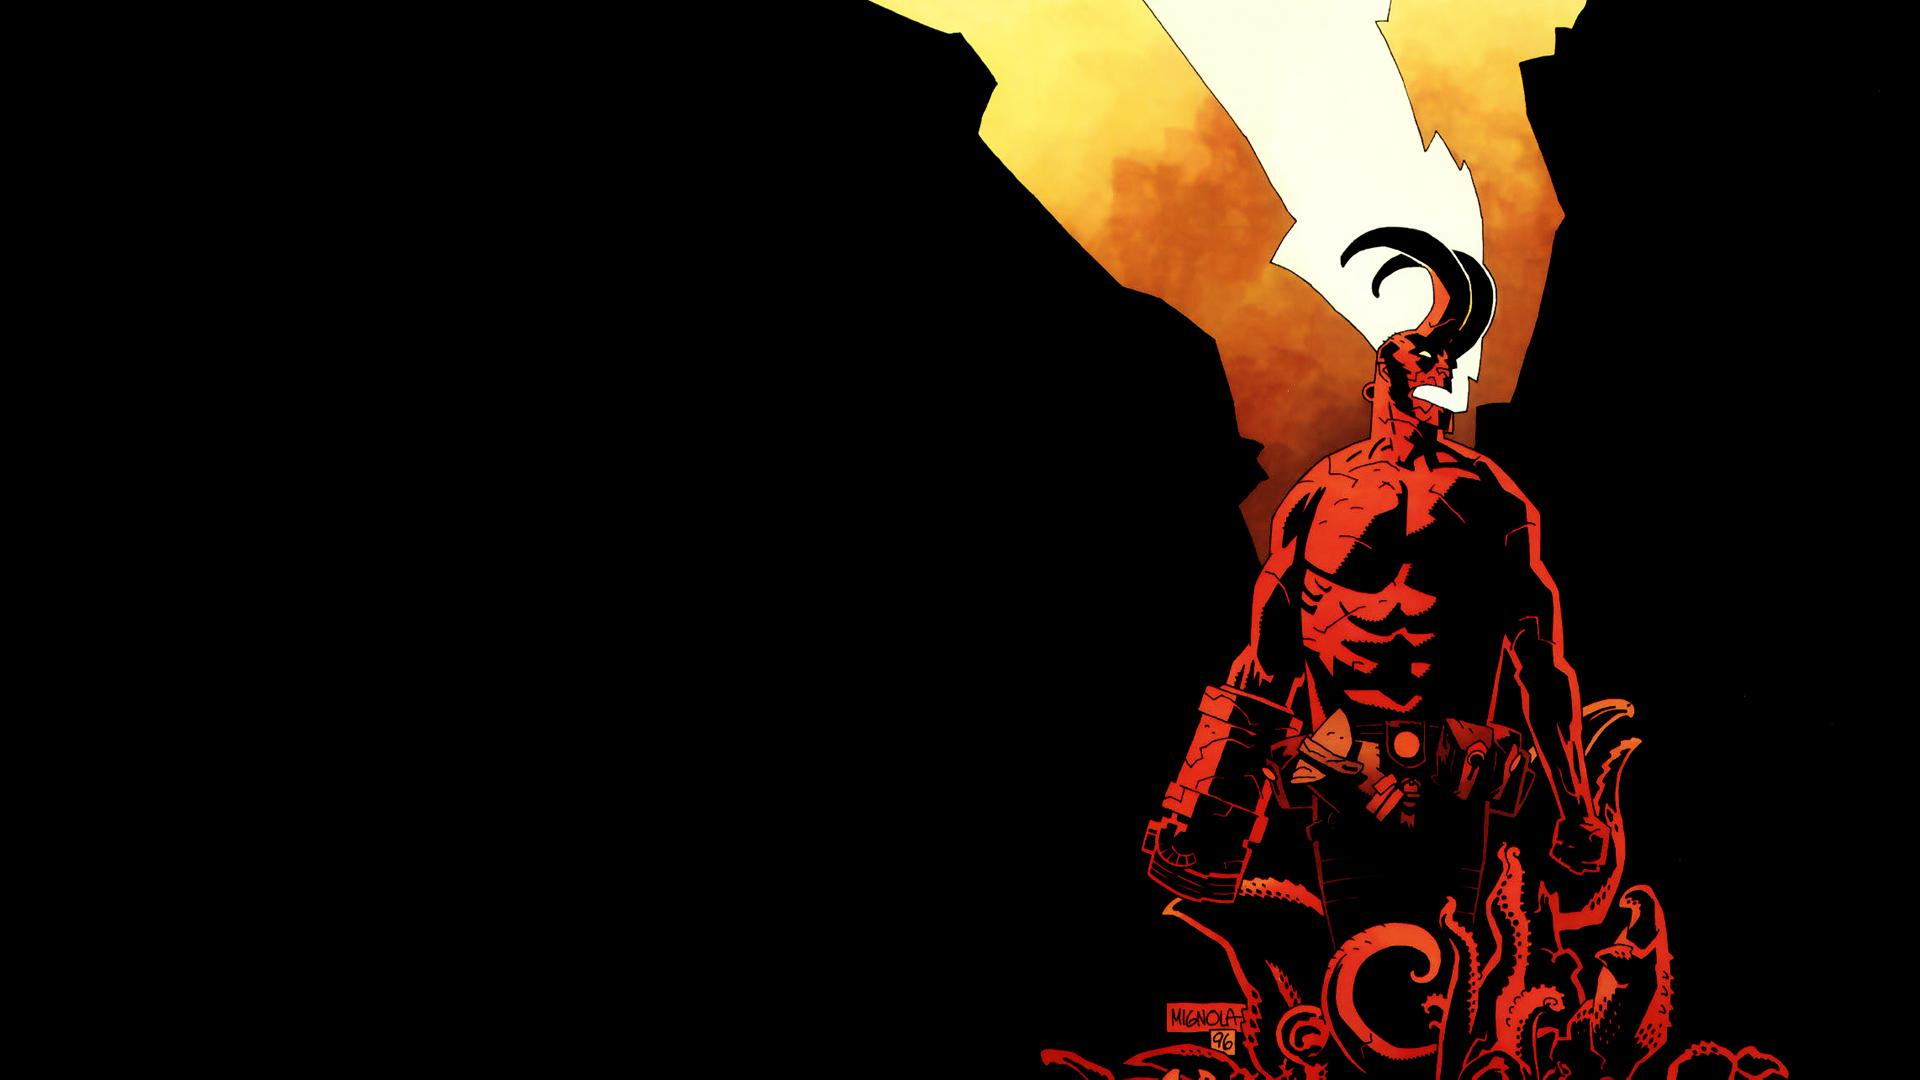 Hellboy Hd Wallpaper Background Image 1920x1080 Id 207120